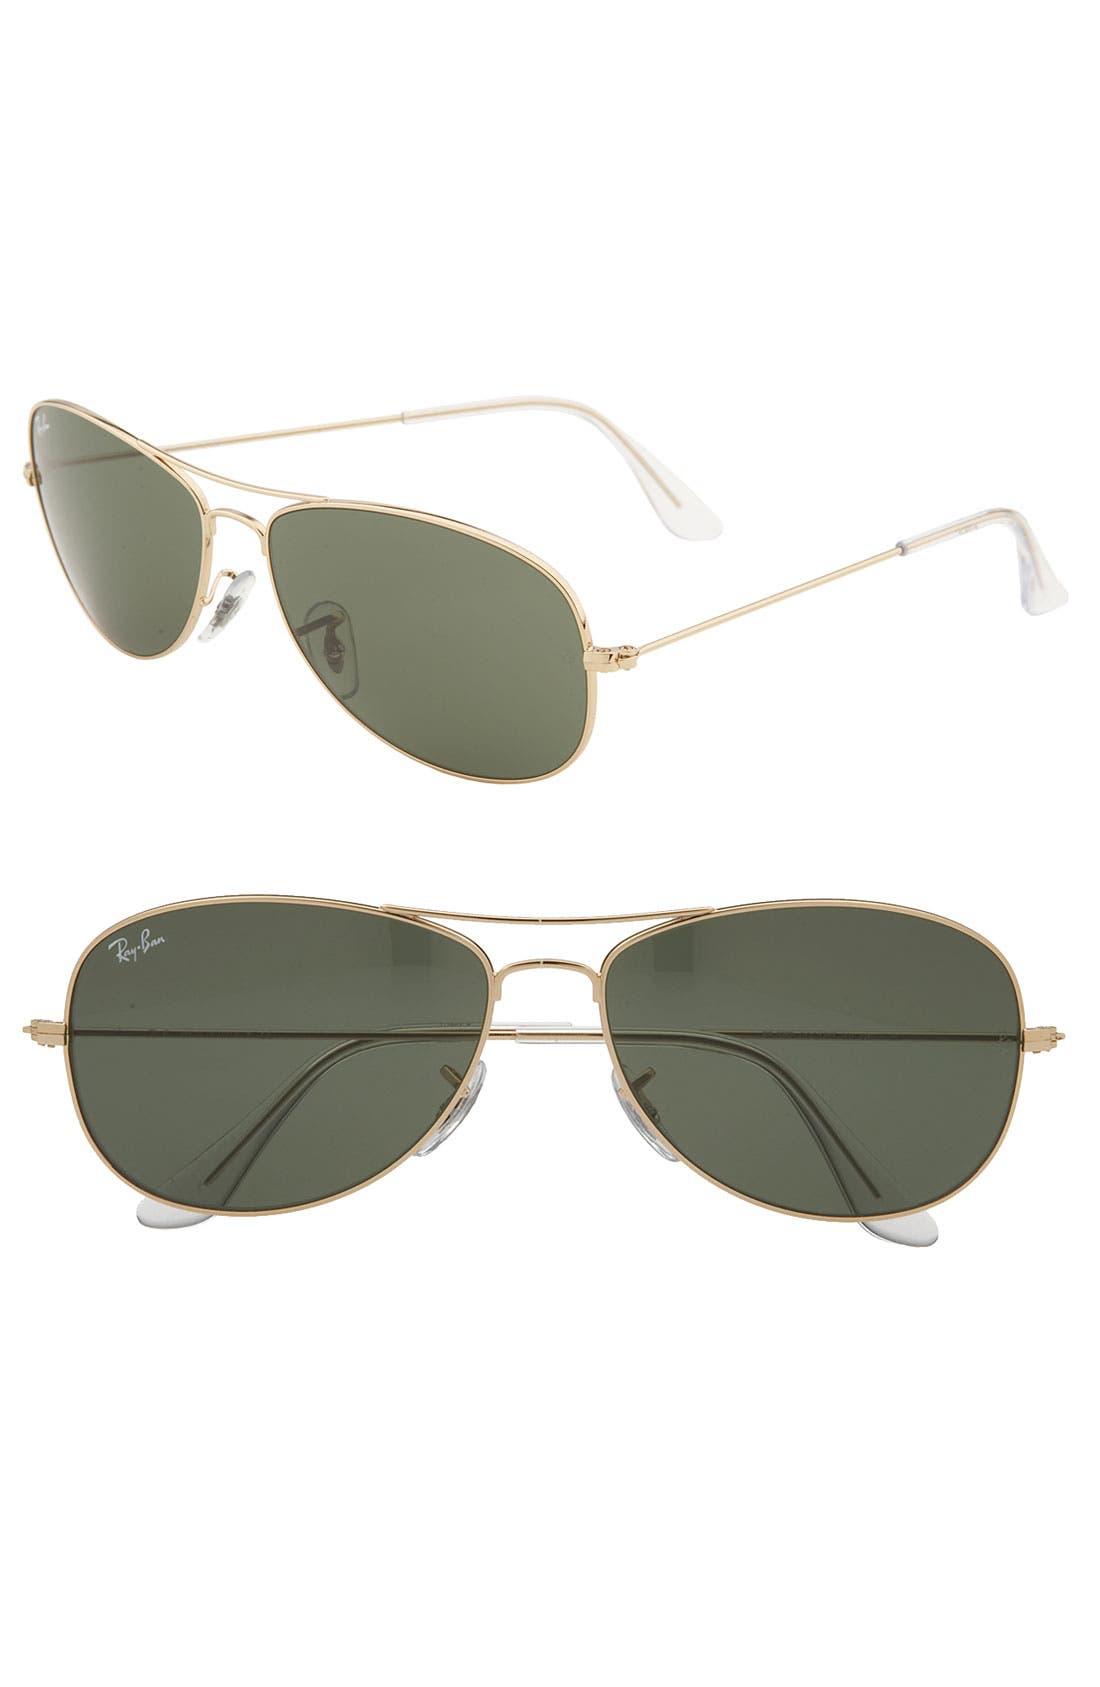 Ray-Ban New Classic Aviator 5m Sunglasses -